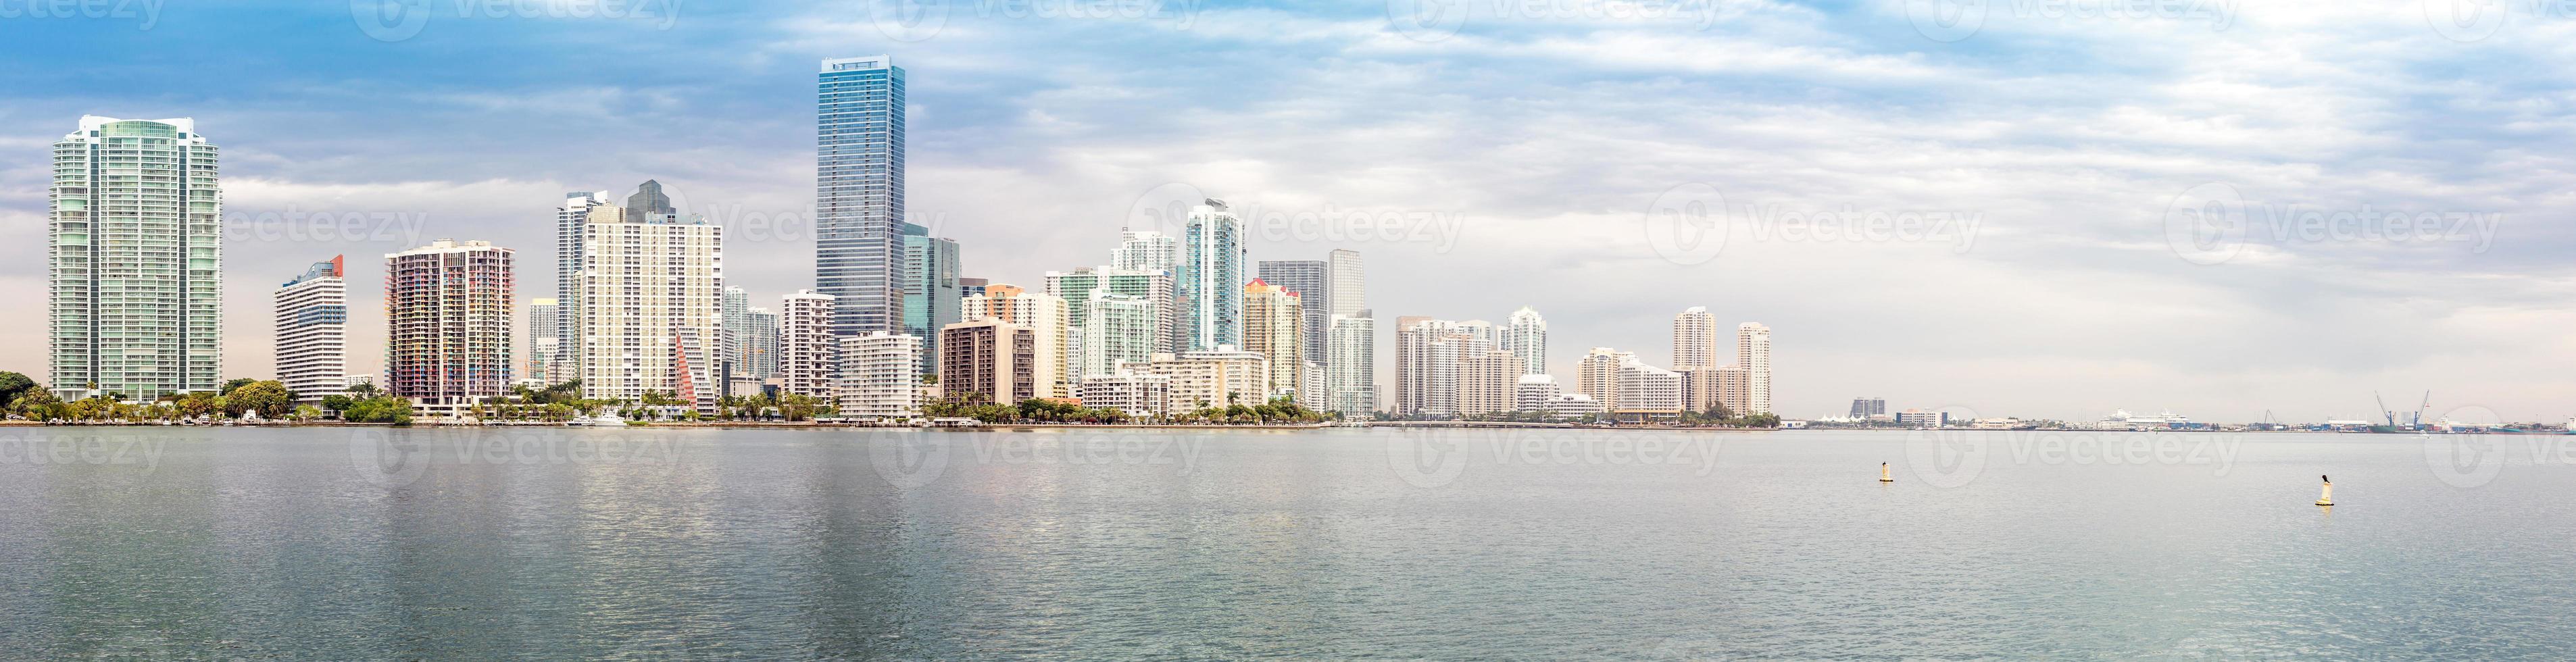 panorama do horizonte de miami da baía de biscayne foto